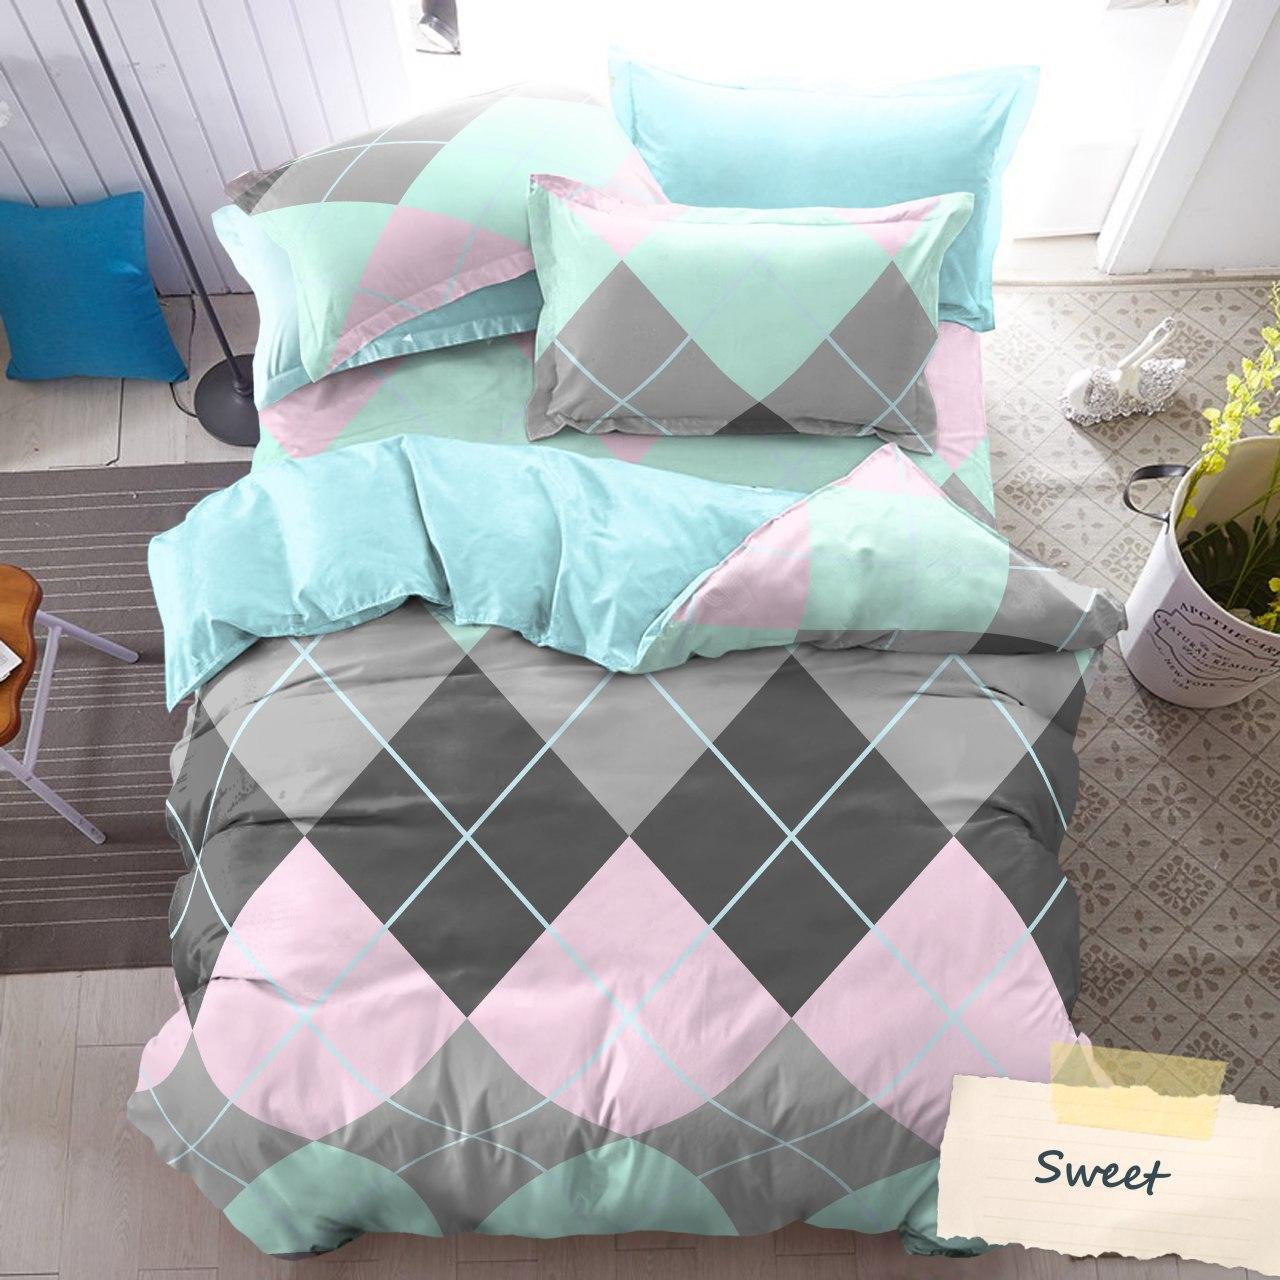 Kintakun Luxury - Bed Cover terbaru Set King Size 180x200x30 Motif Sweet